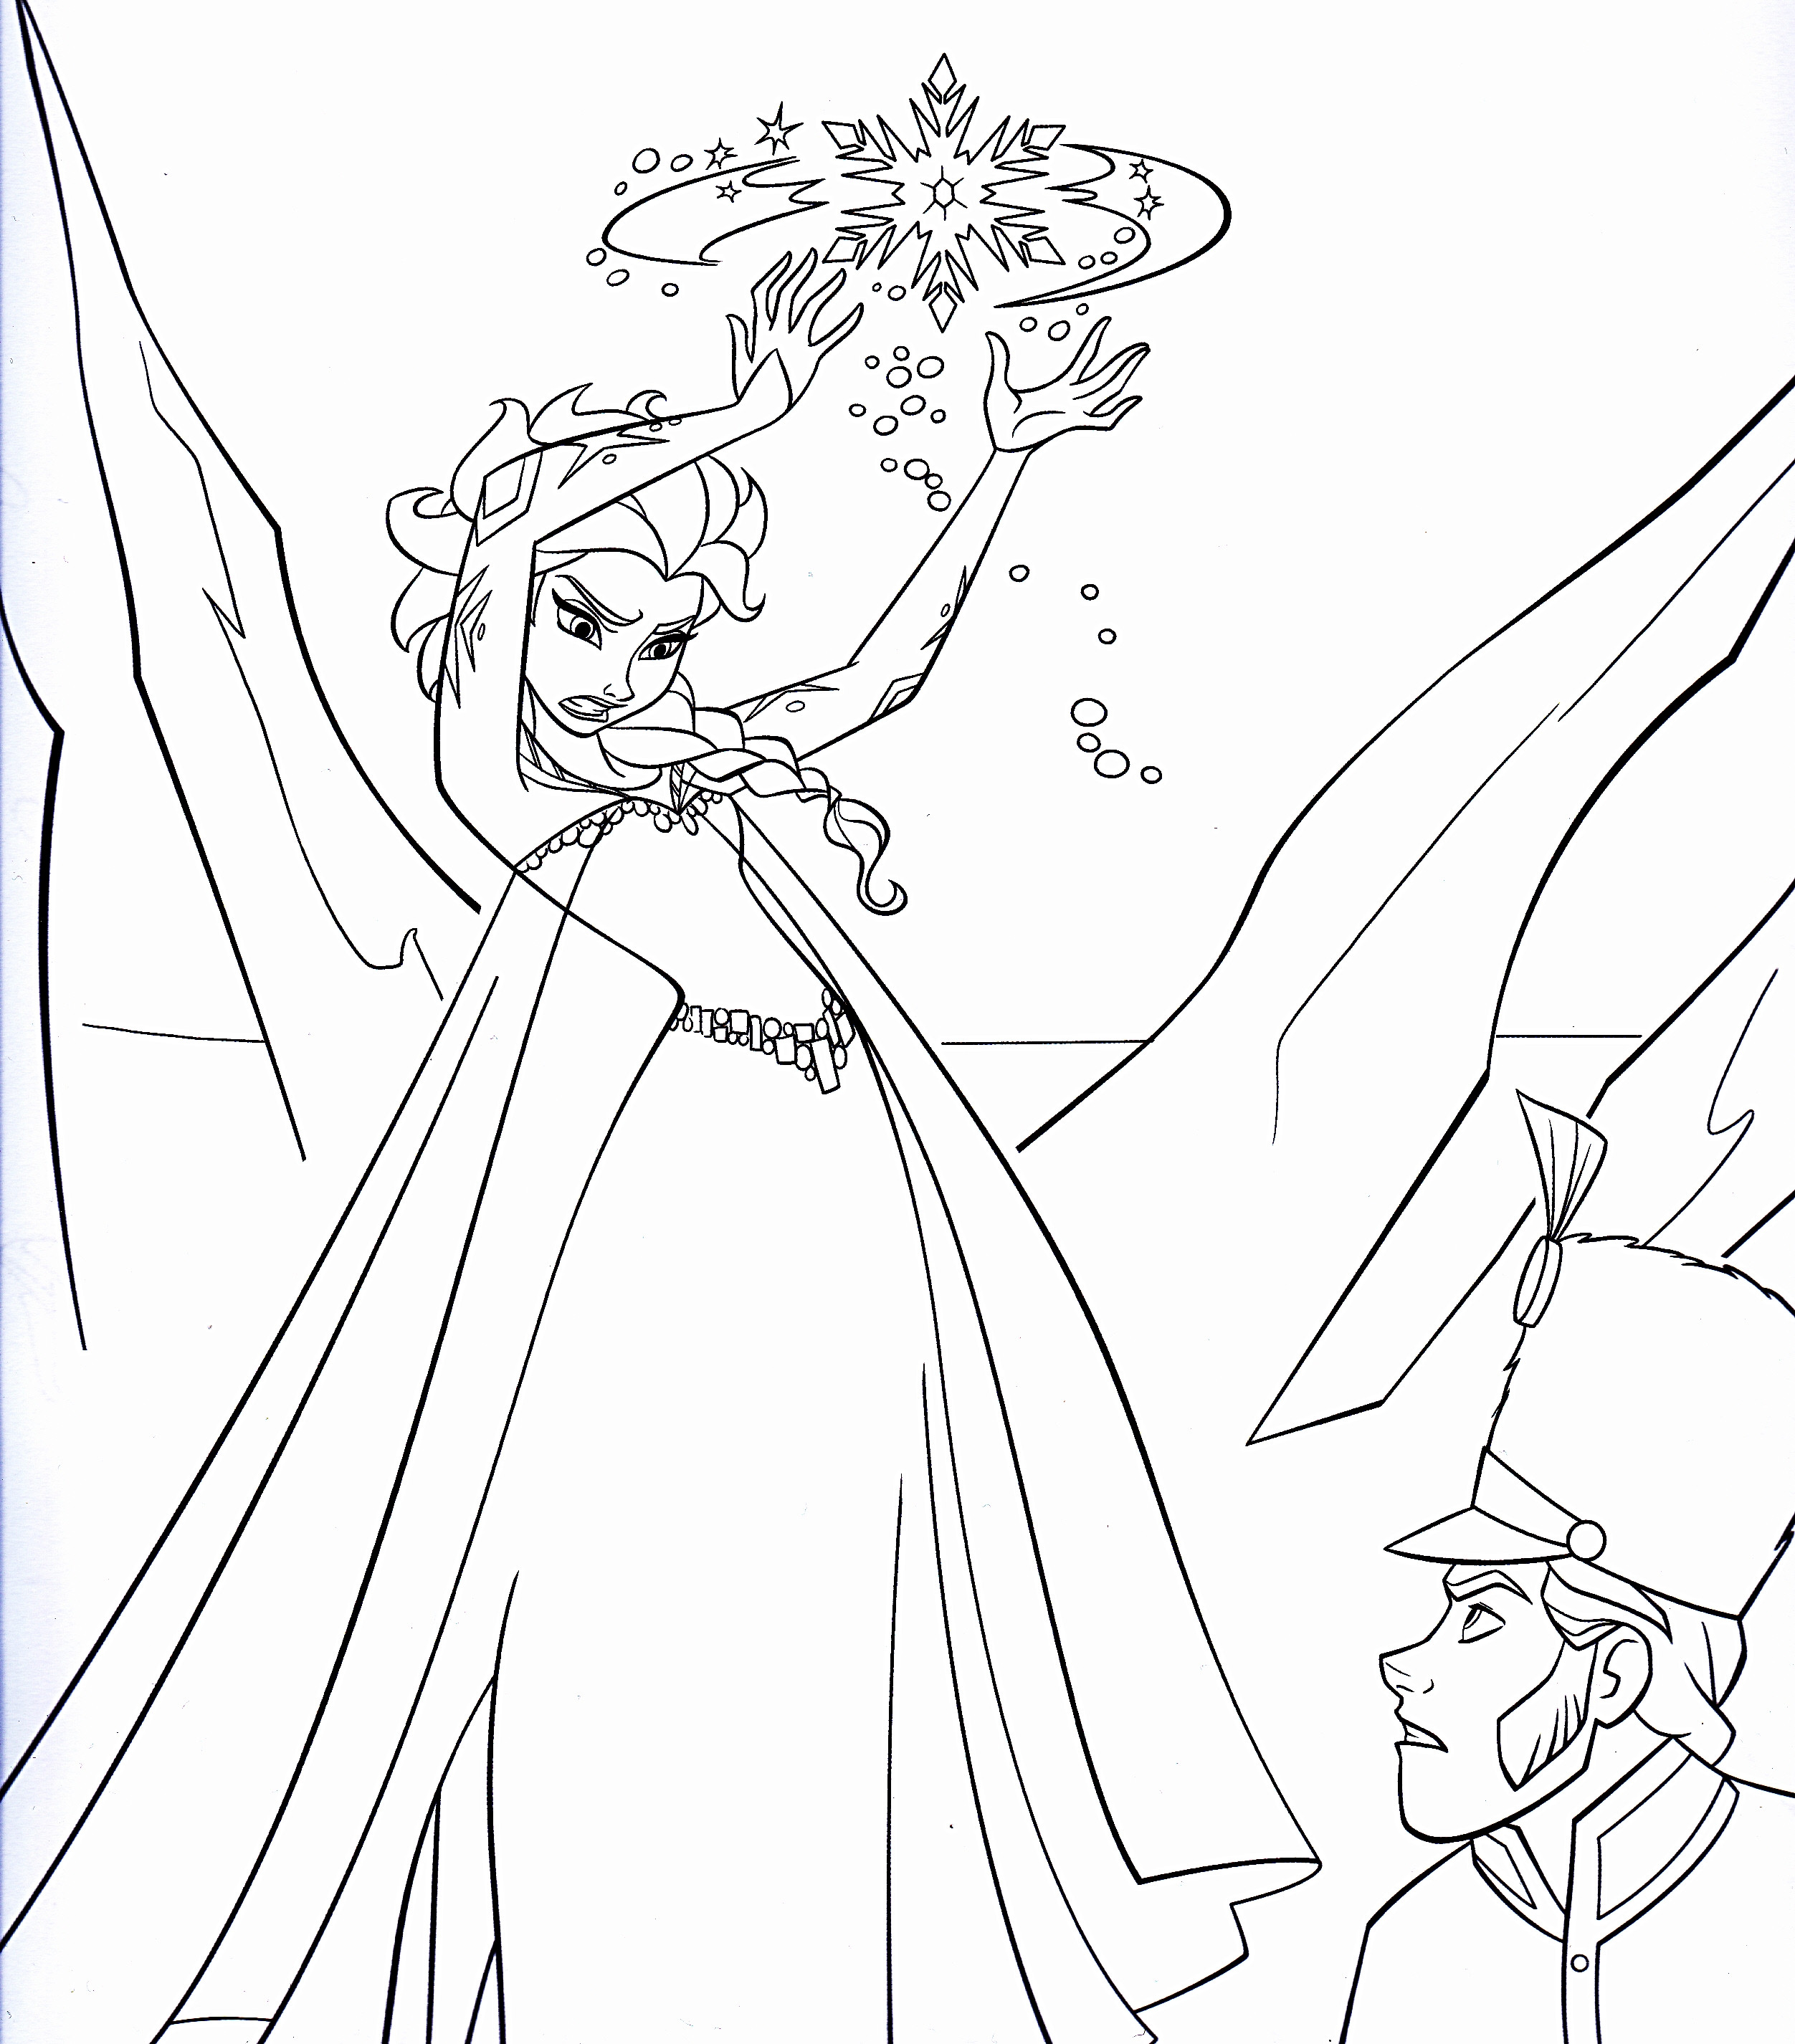 Disney Frozen Coloring Pages  Disney's Frozen Colouring Pages